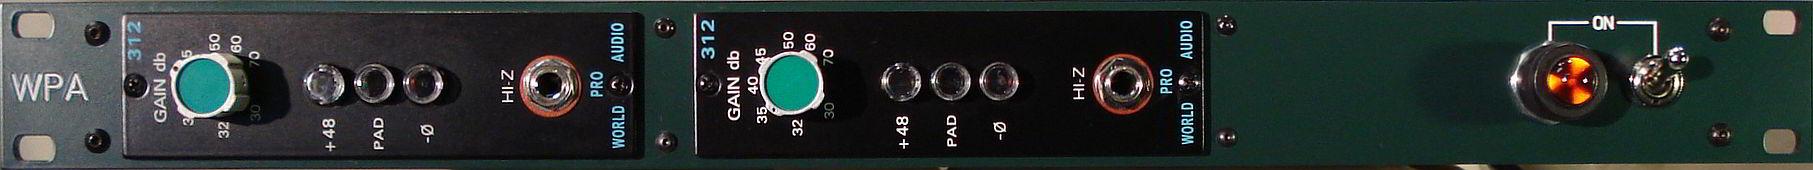 API 312 mic pre x2 racked